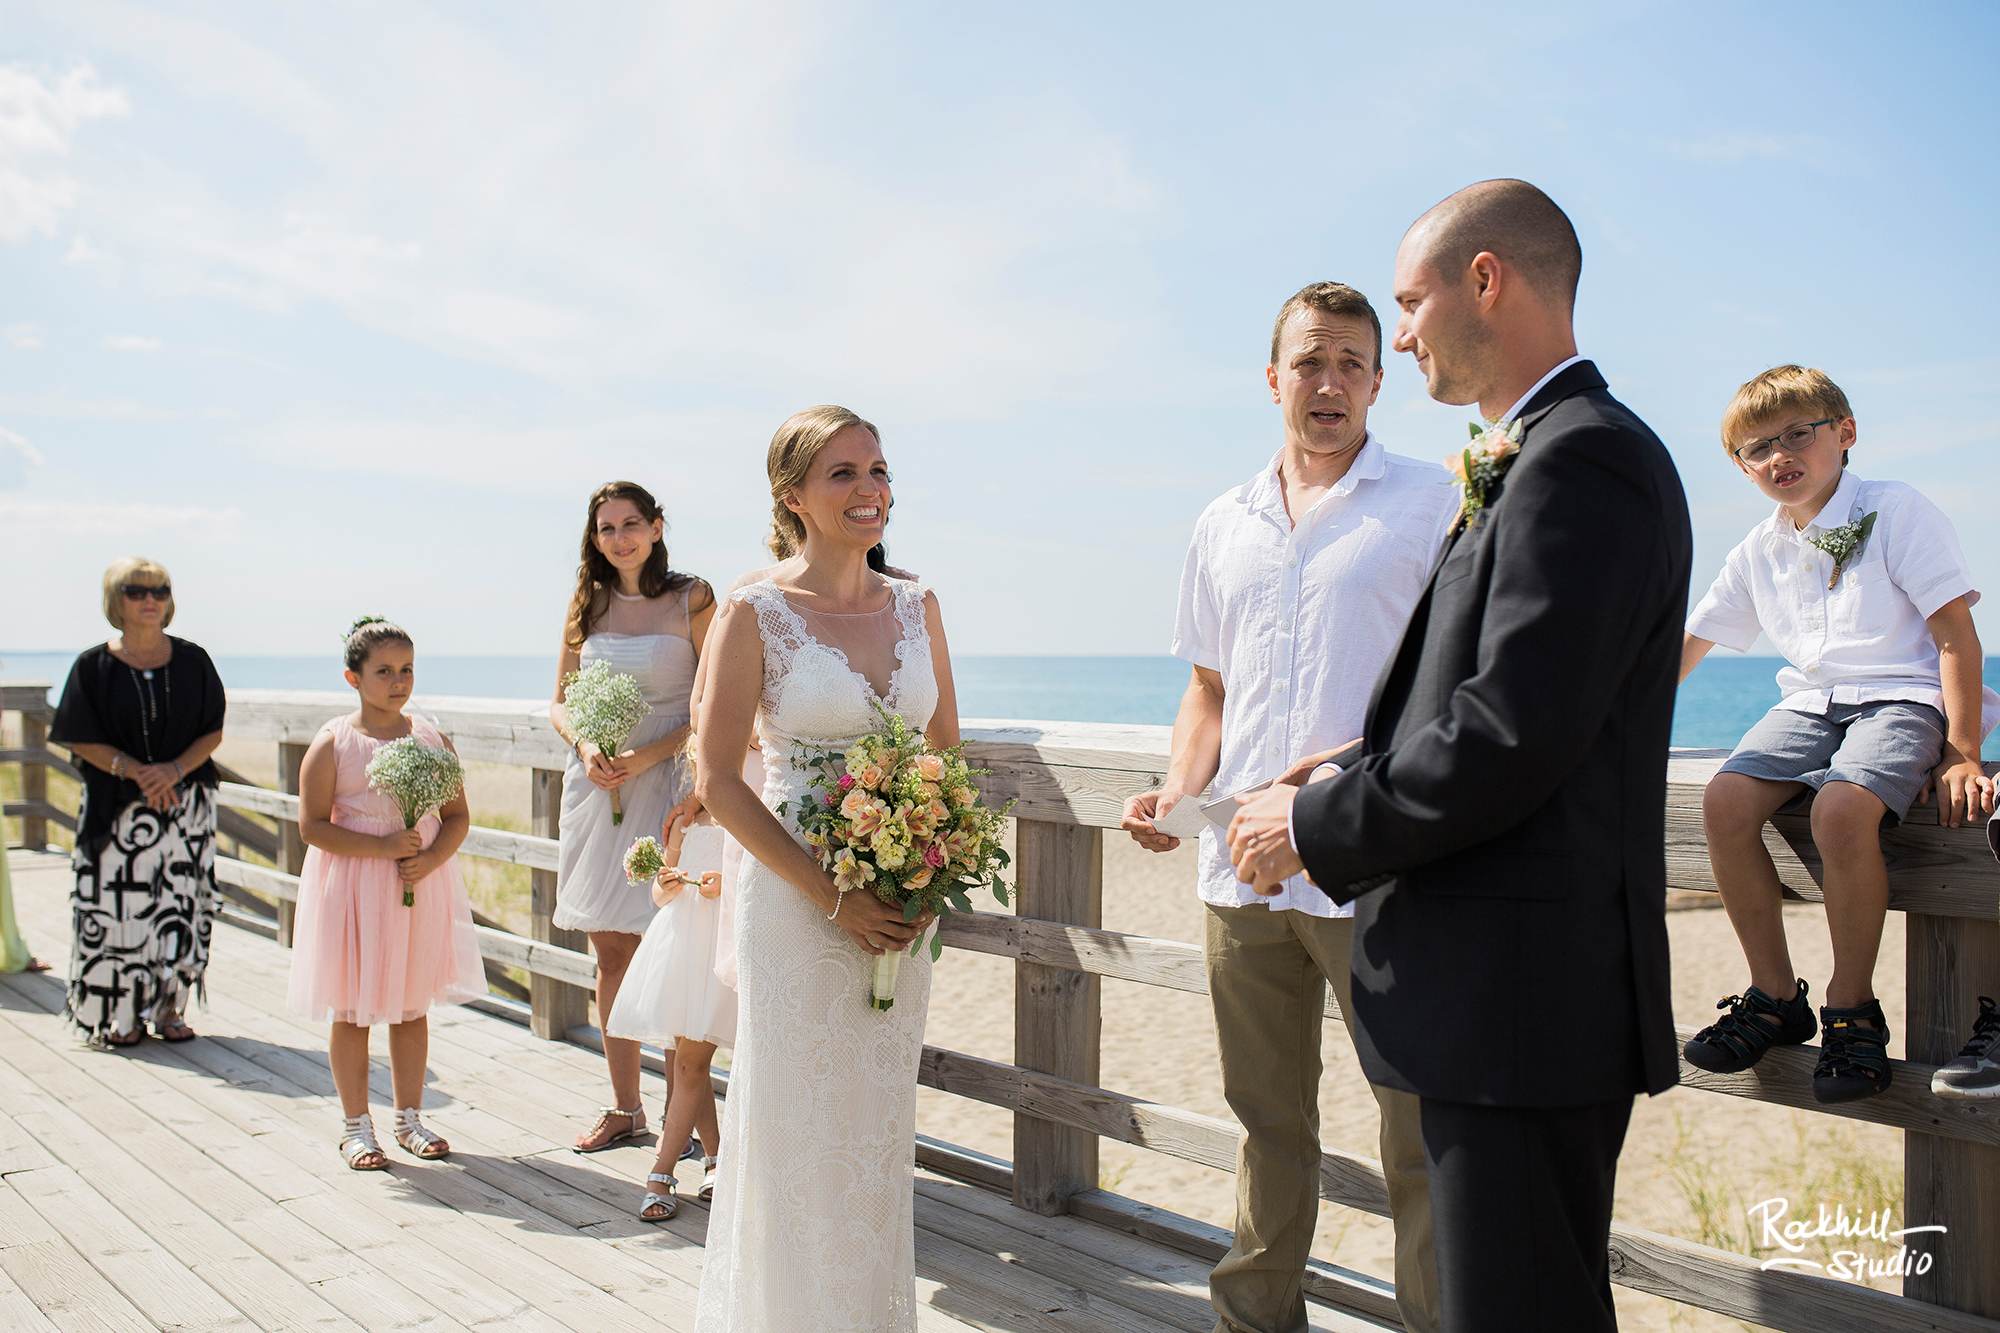 grand-marais-wedding-photography-upper-peninsula-northern-michigan-rockhill-33.jpg